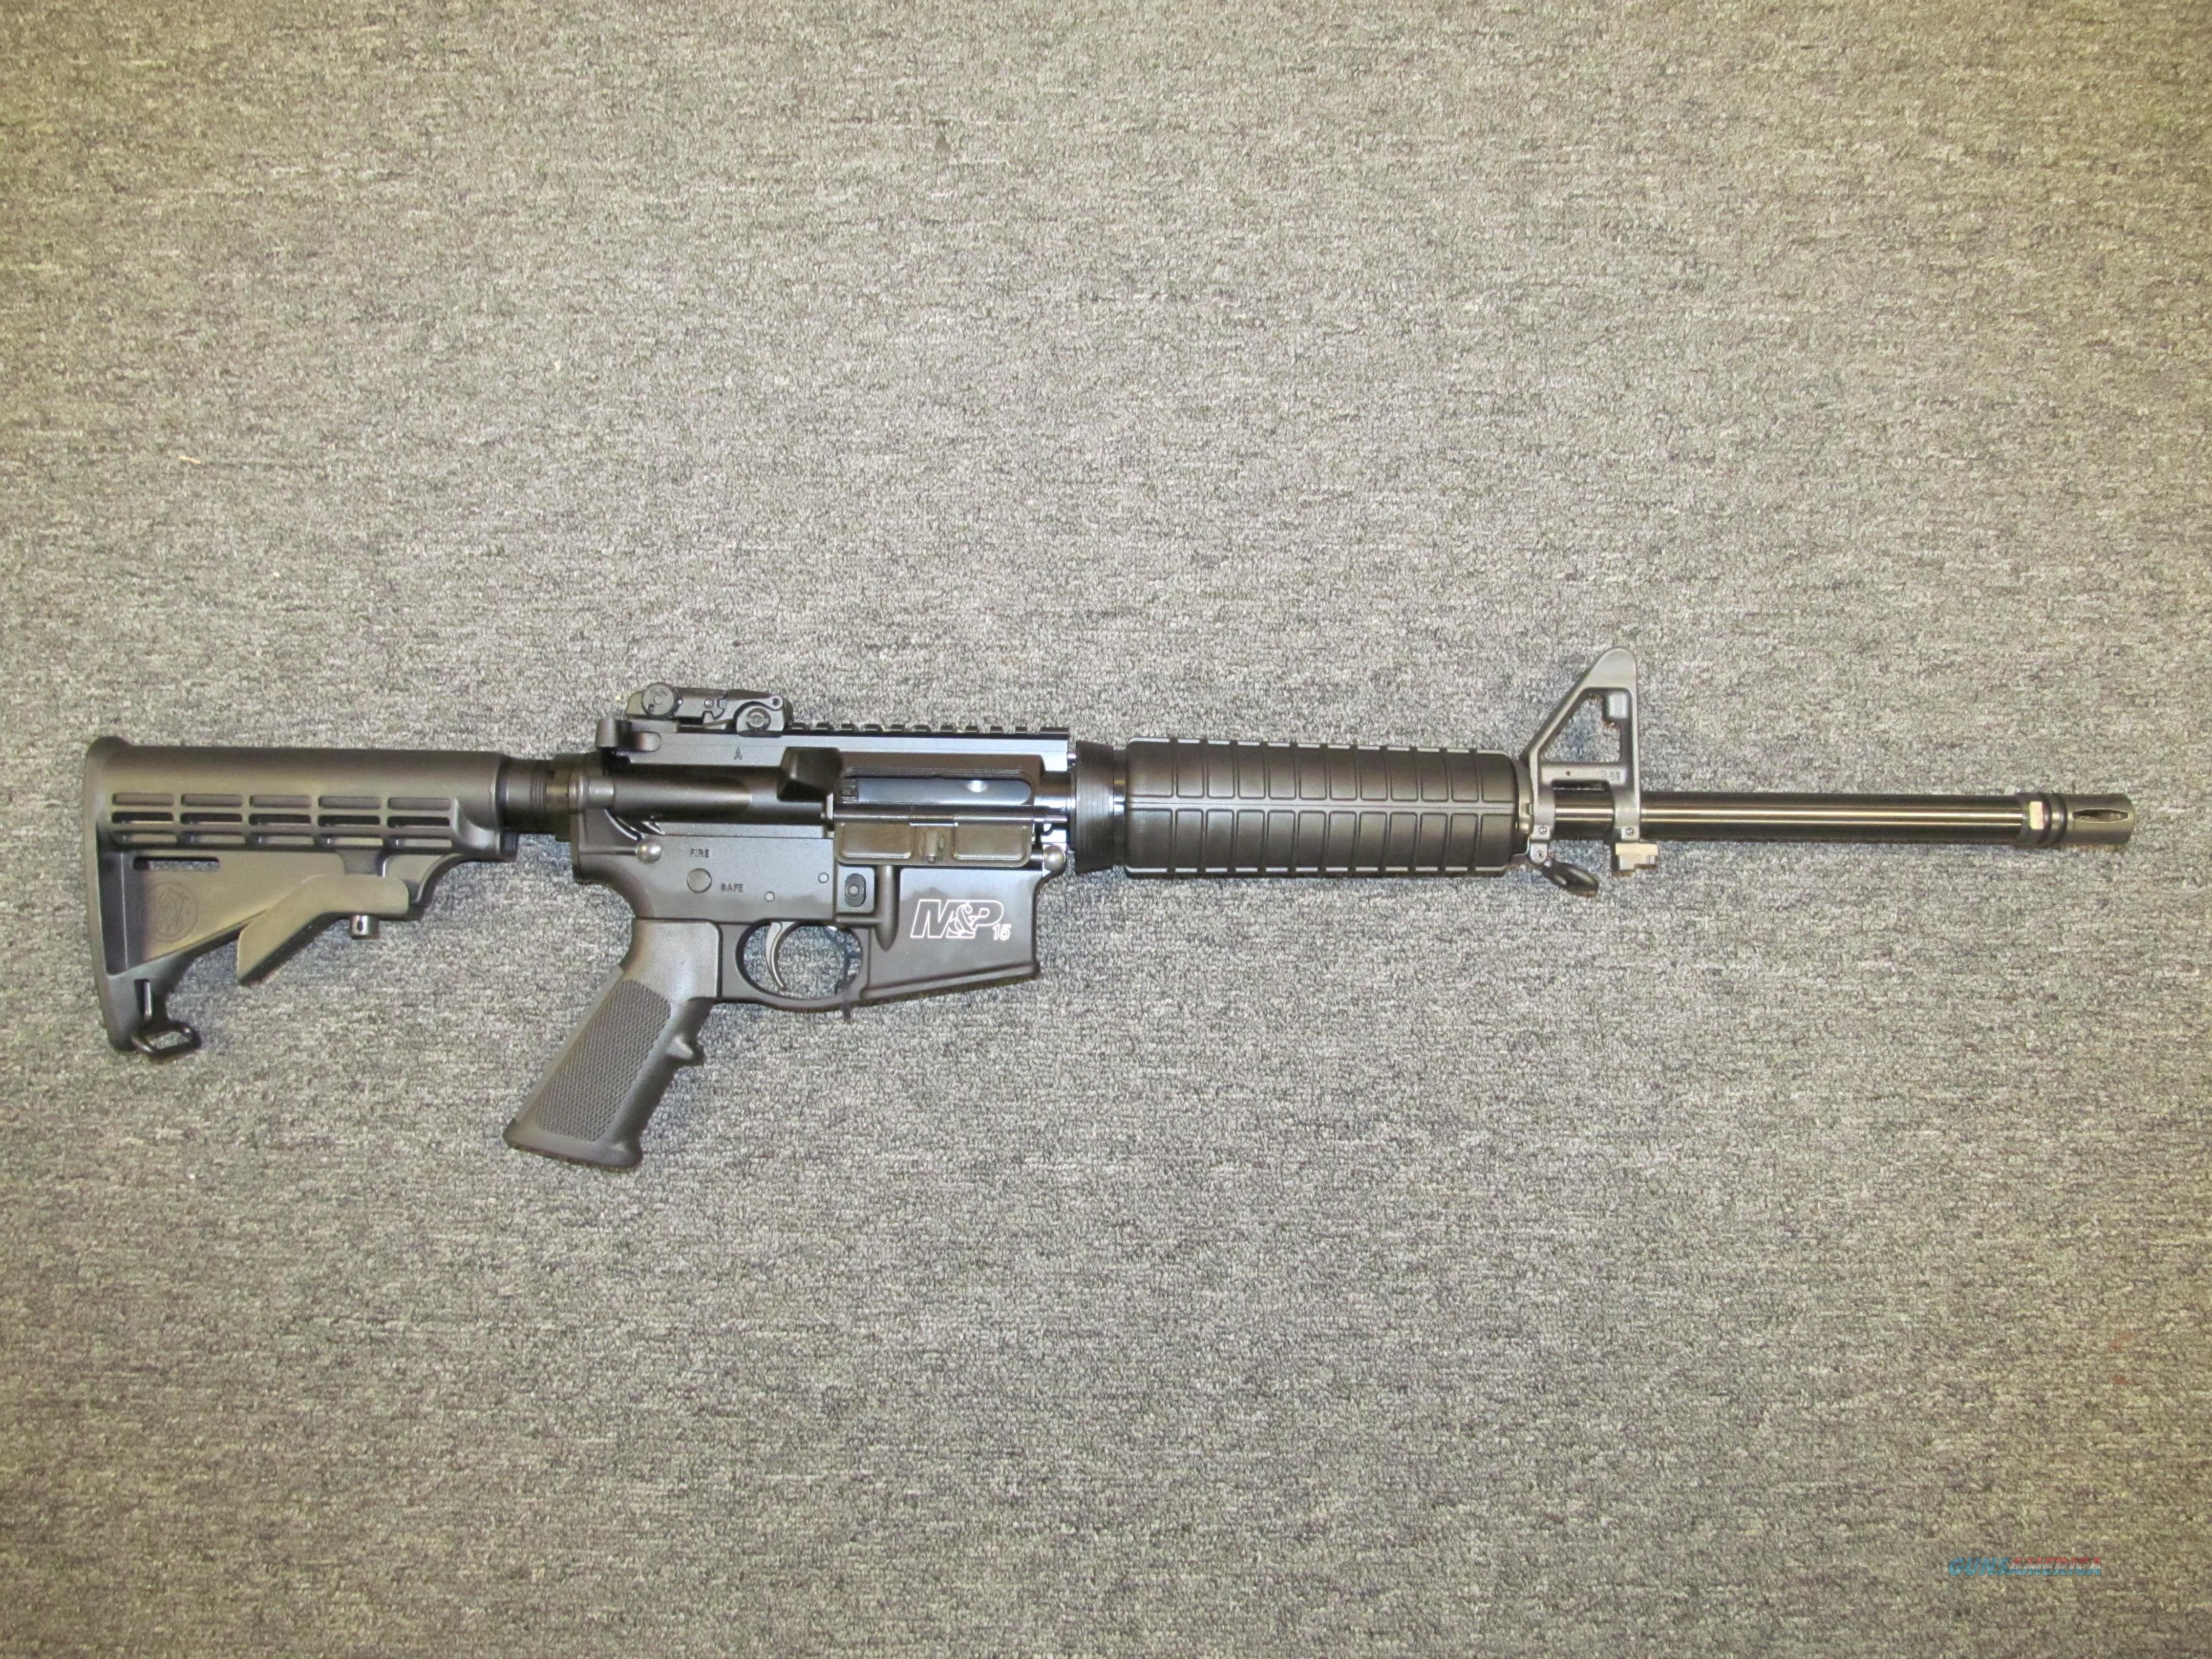 Smith & Wesson M&P15 Sport II  5.56mm  Guns > Rifles > Smith & Wesson Rifles > M&P